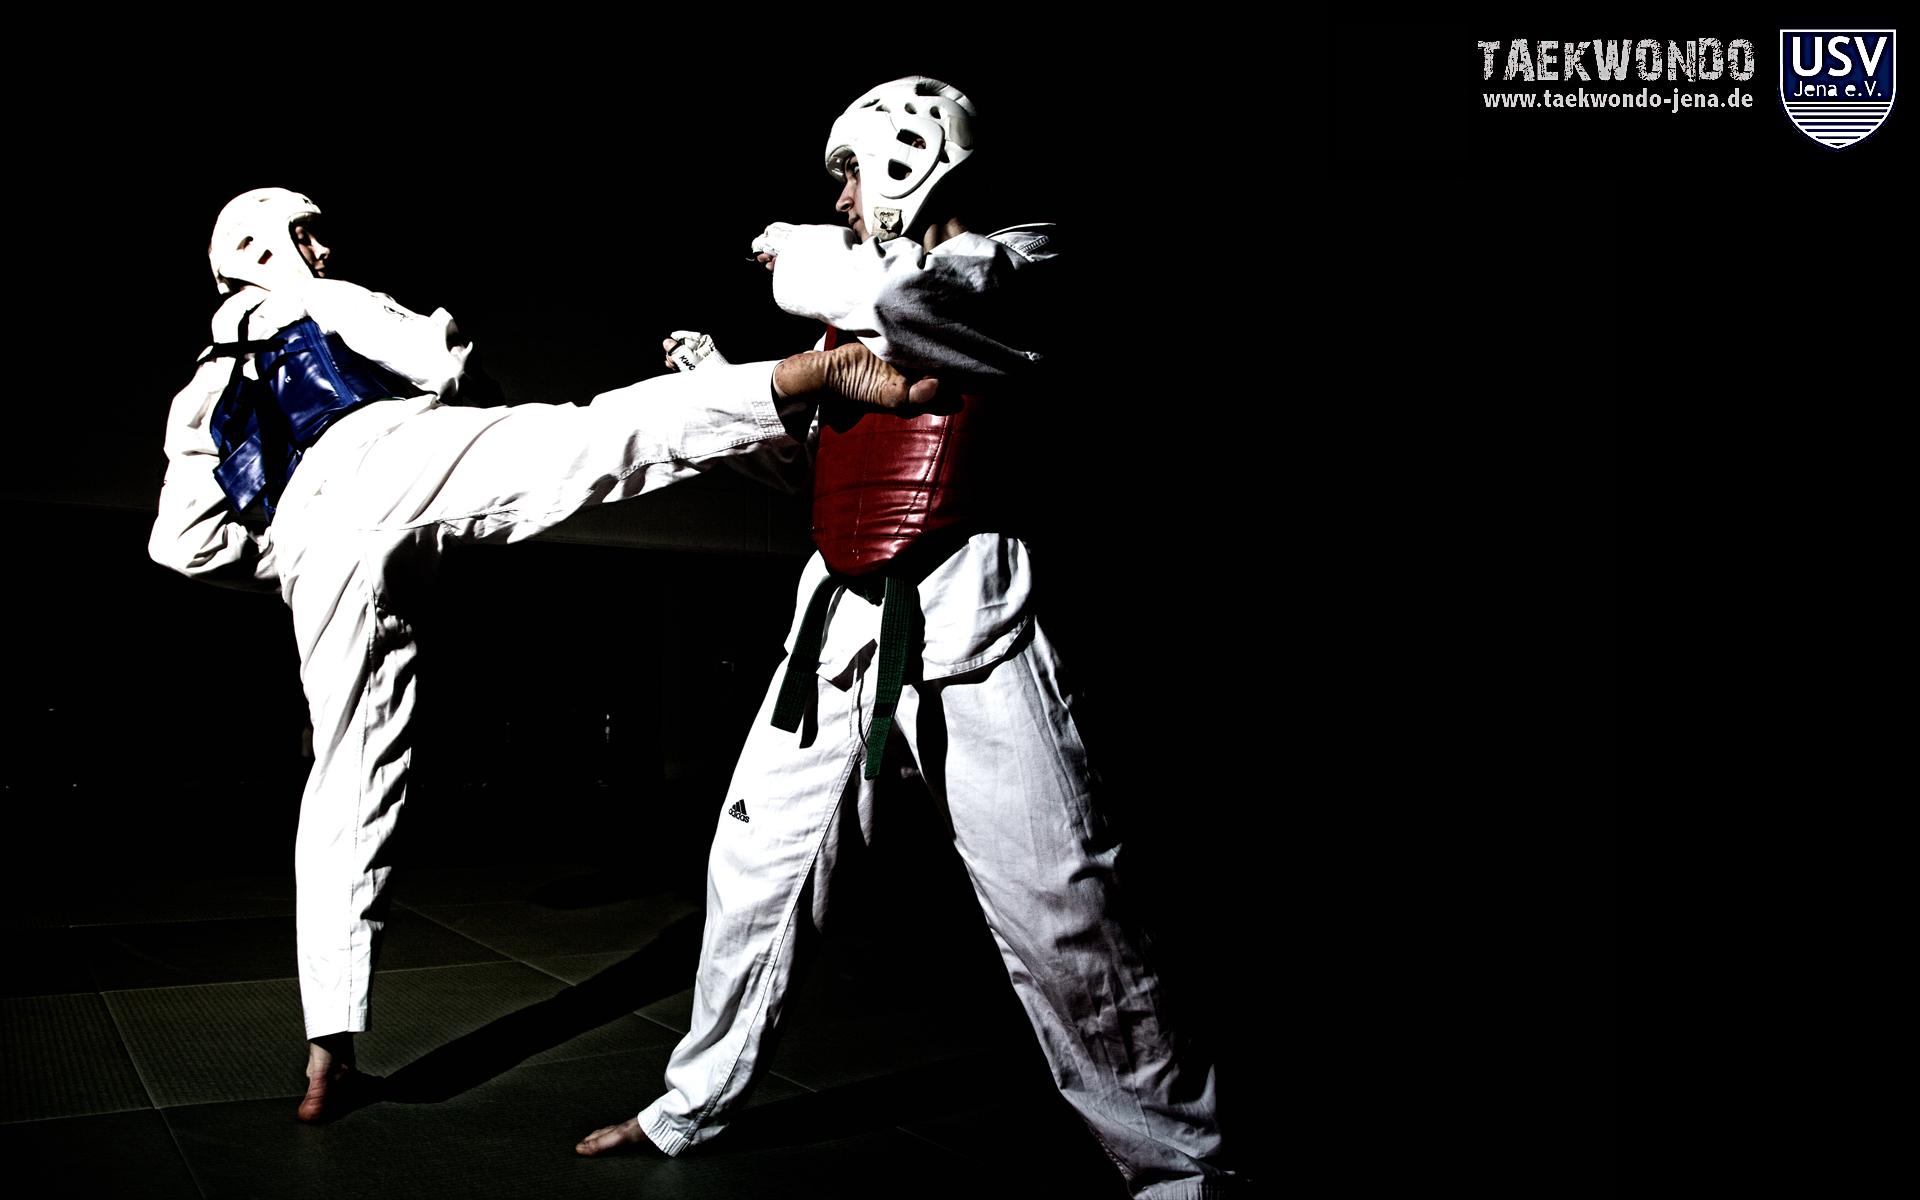 Taekwondo wallpaper   414796 1920x1200